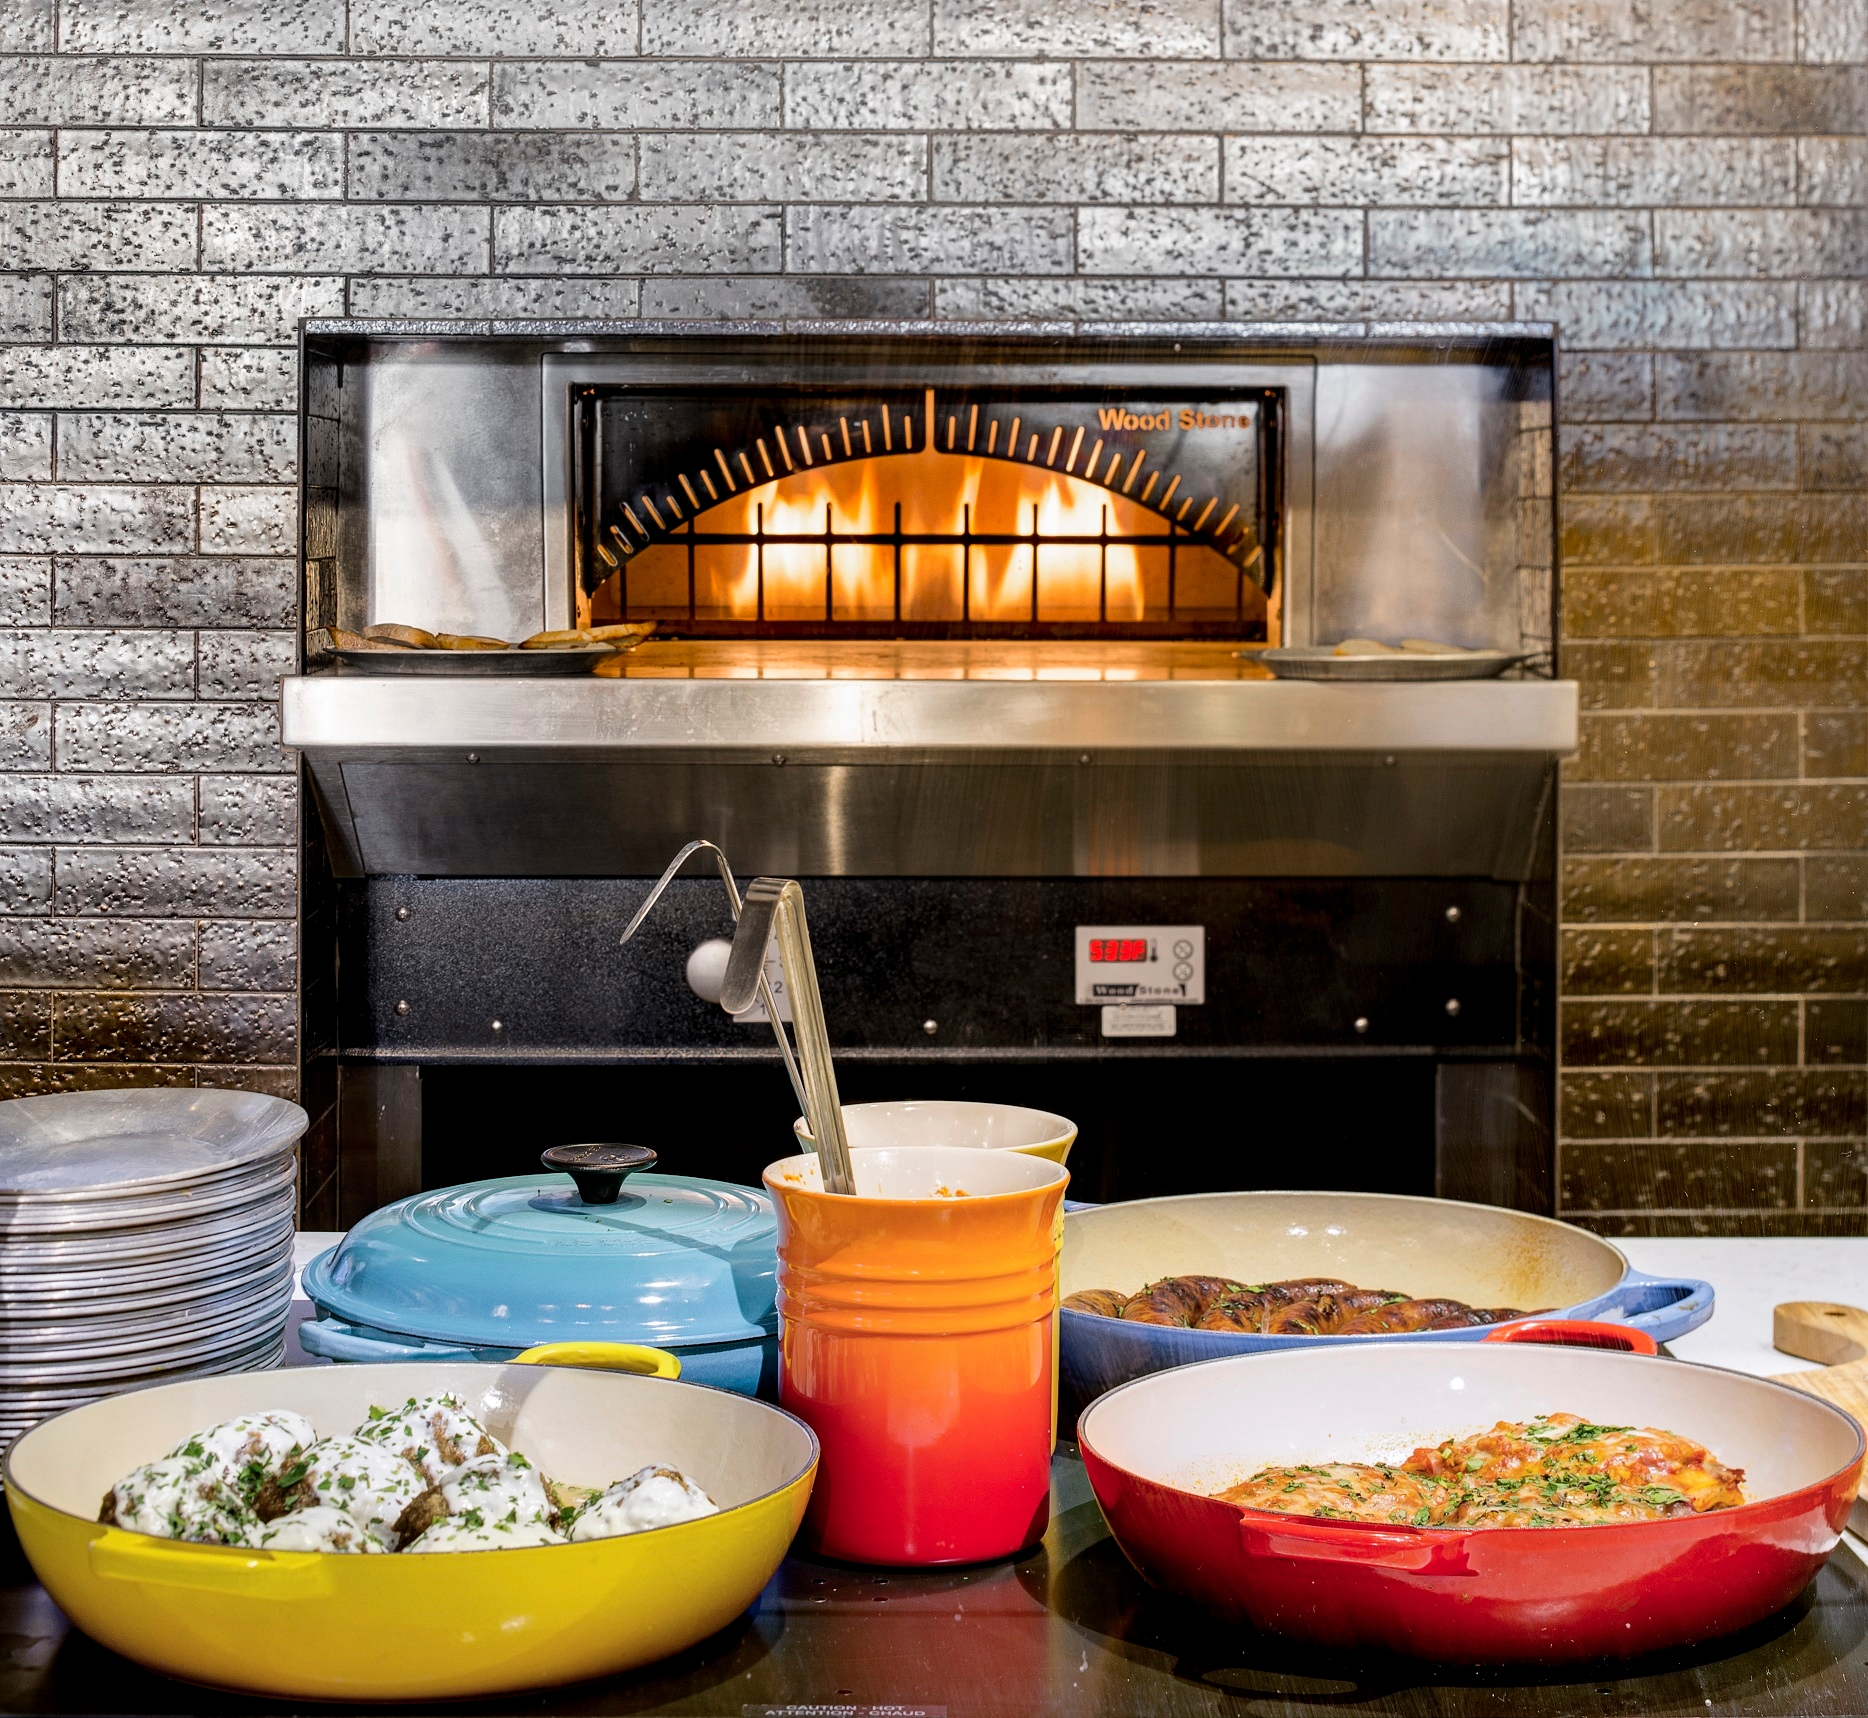 Spoleto - My Italian Kitchen (Florida Mall) in Orlando, FL 32809 ...